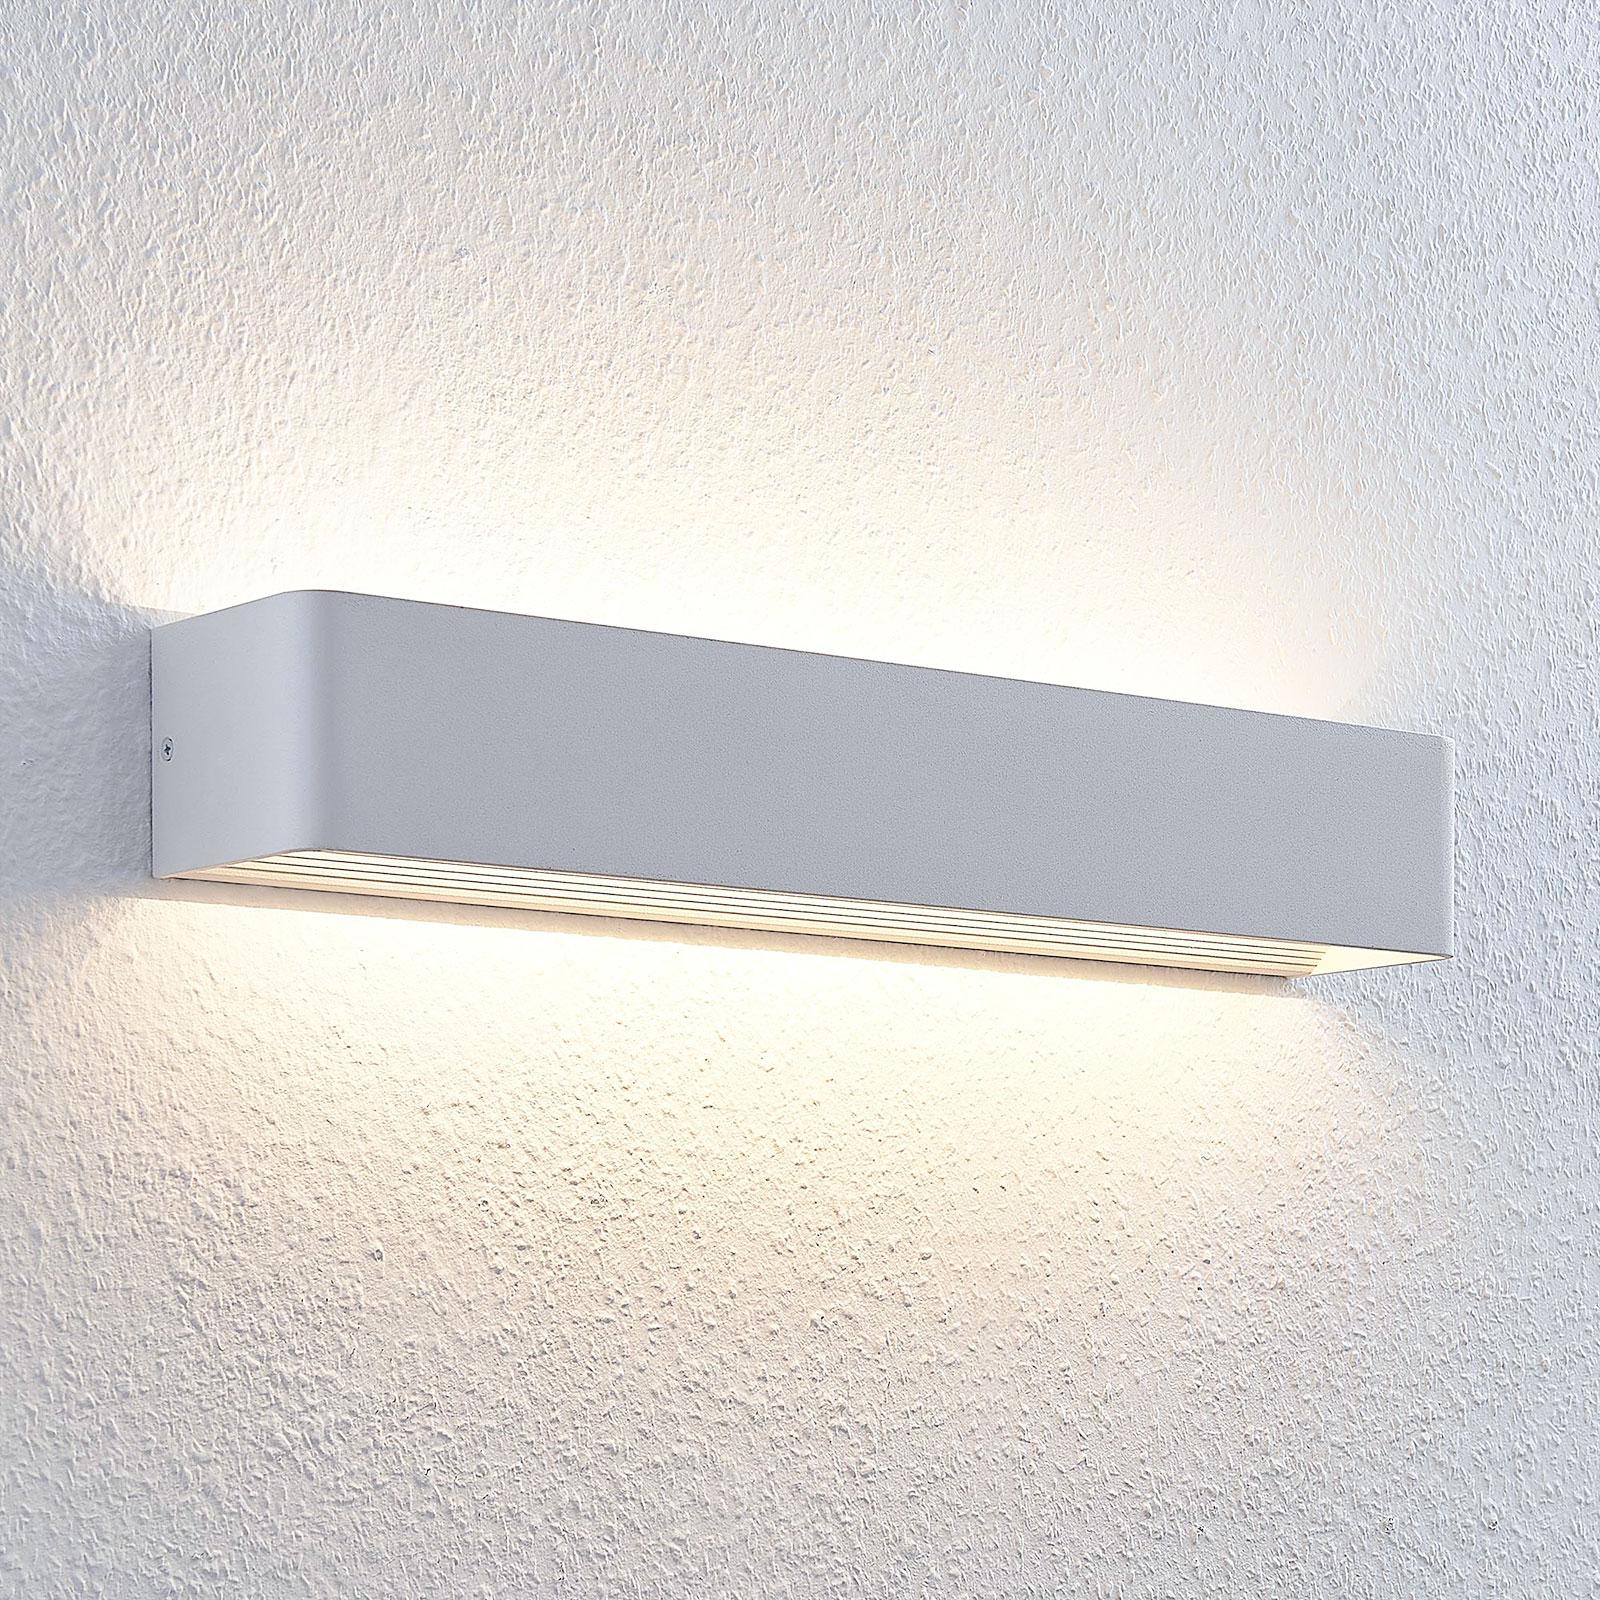 LED-Wandleuchte Lonisa, weiß, 53 cm